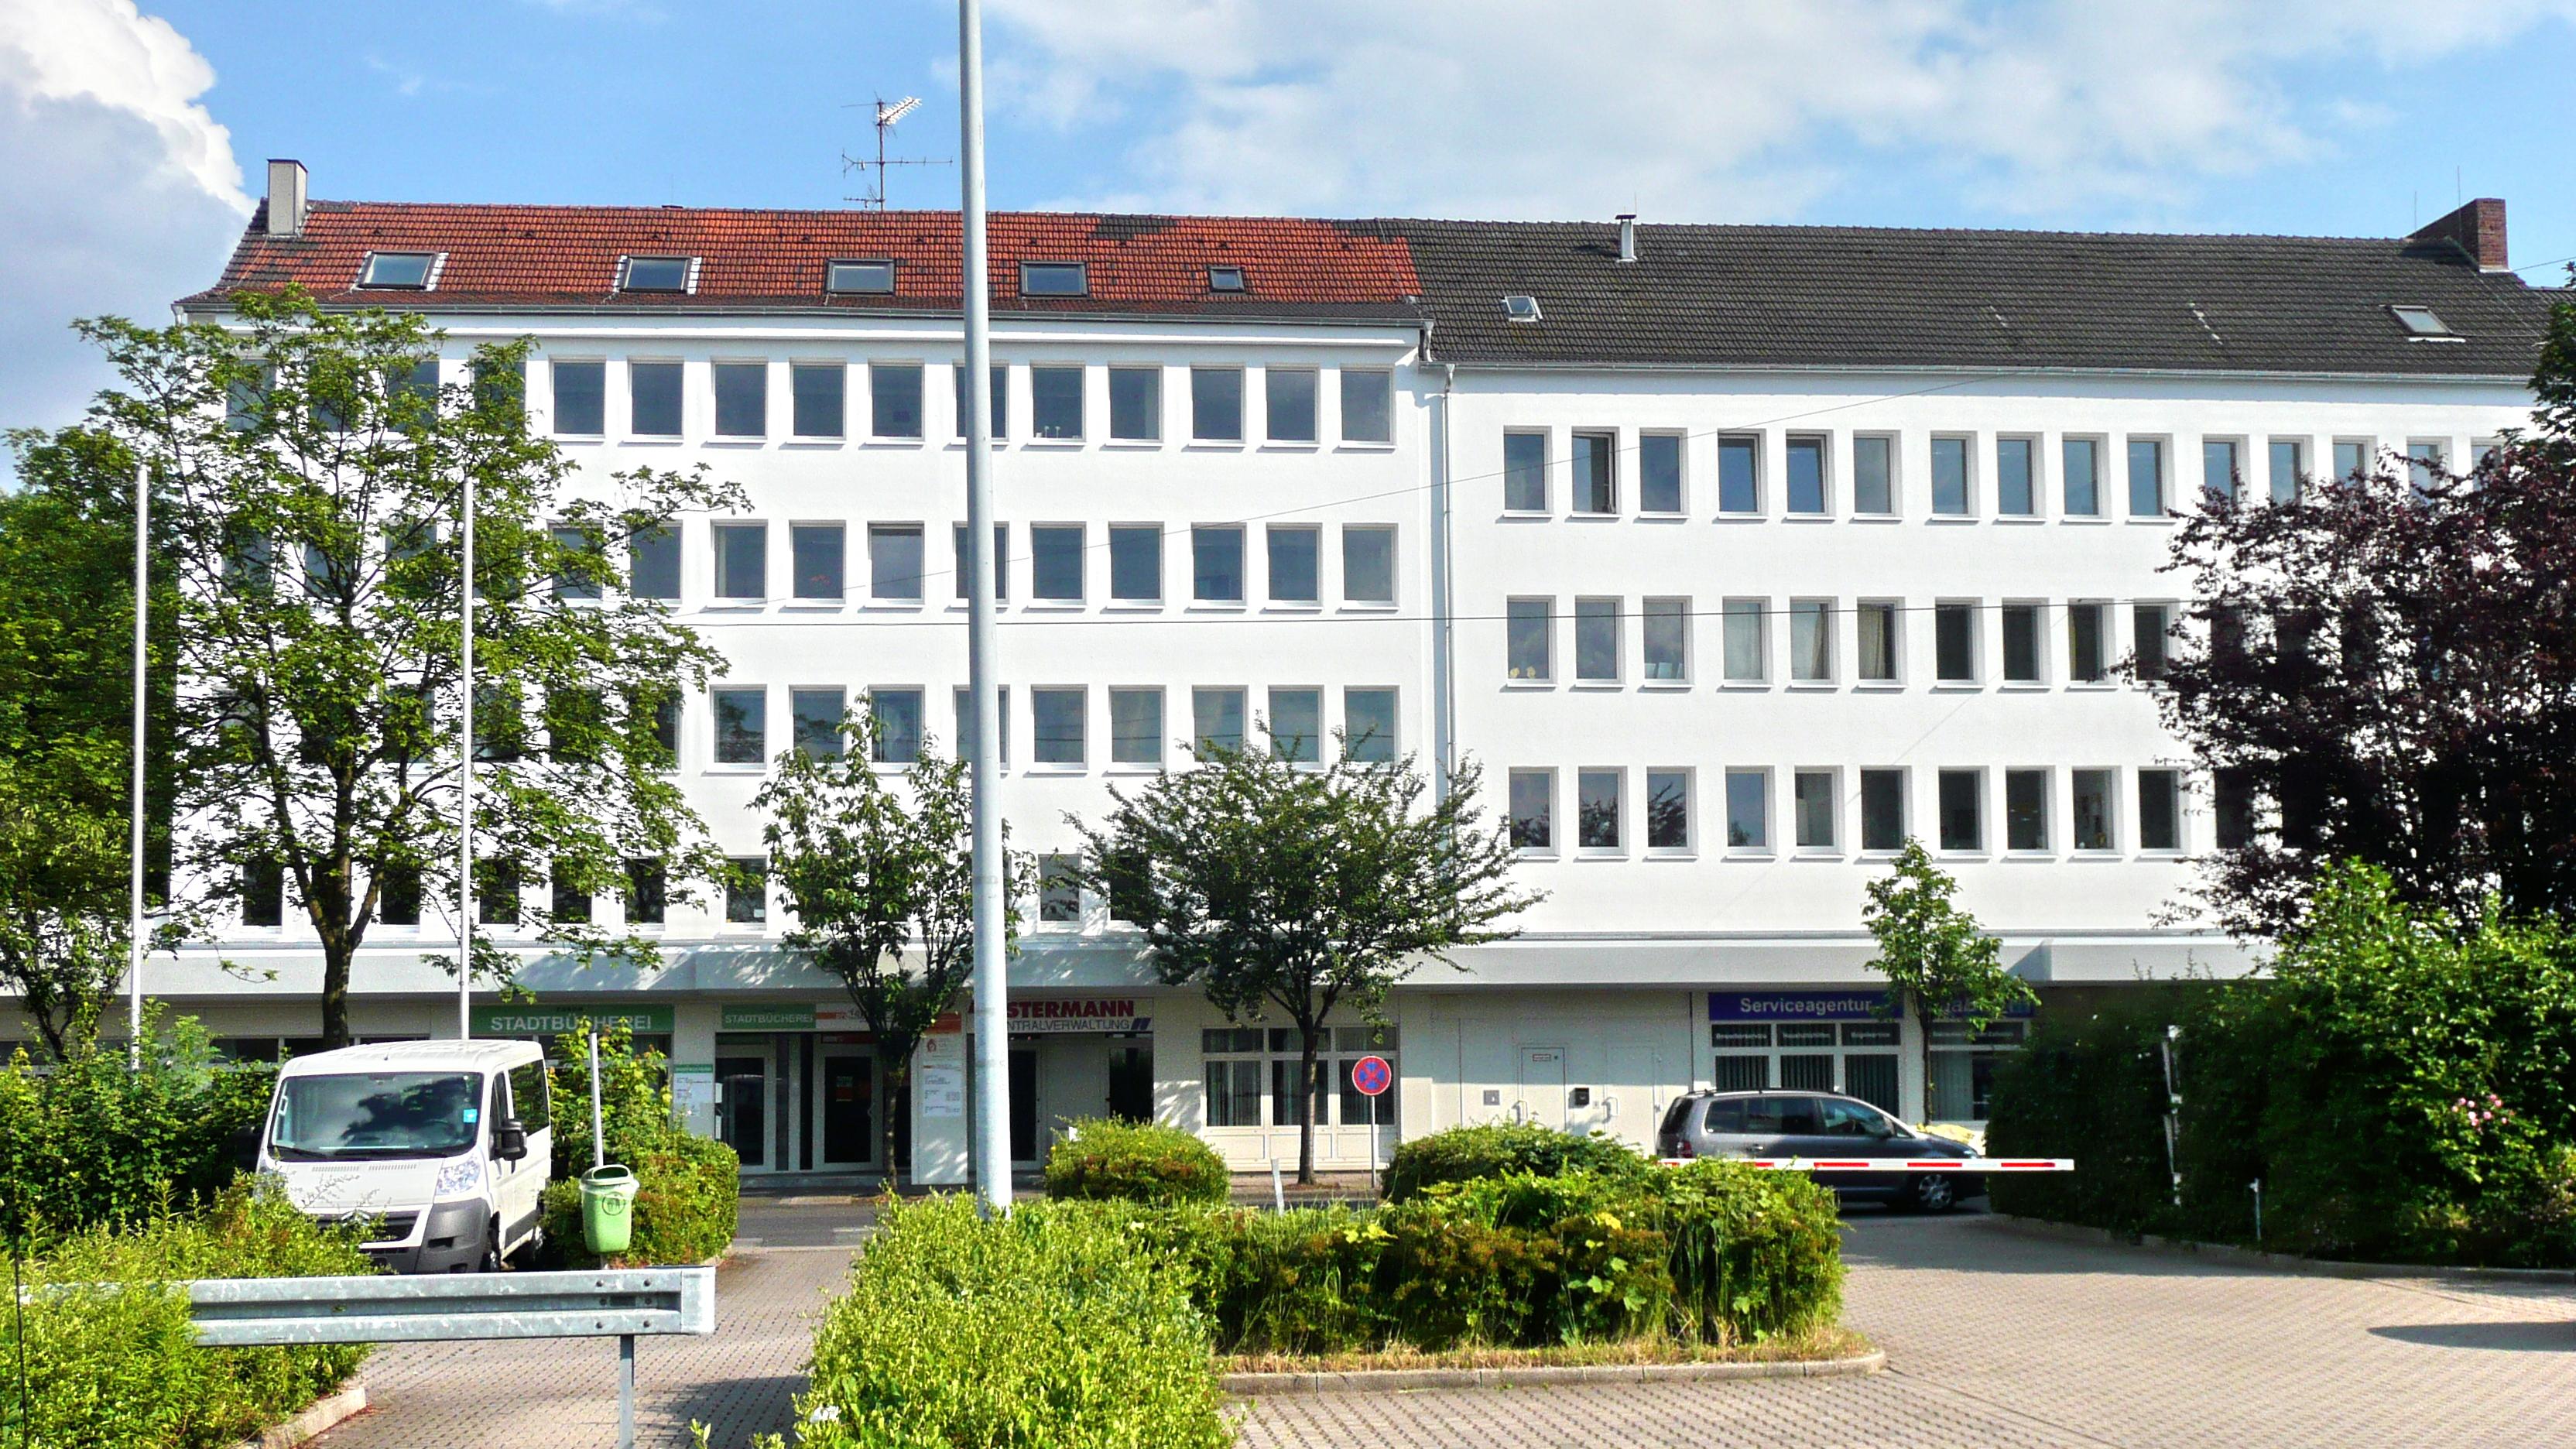 File Witten Annen Stammhaus Ostermann Jpg Wikimedia Commons